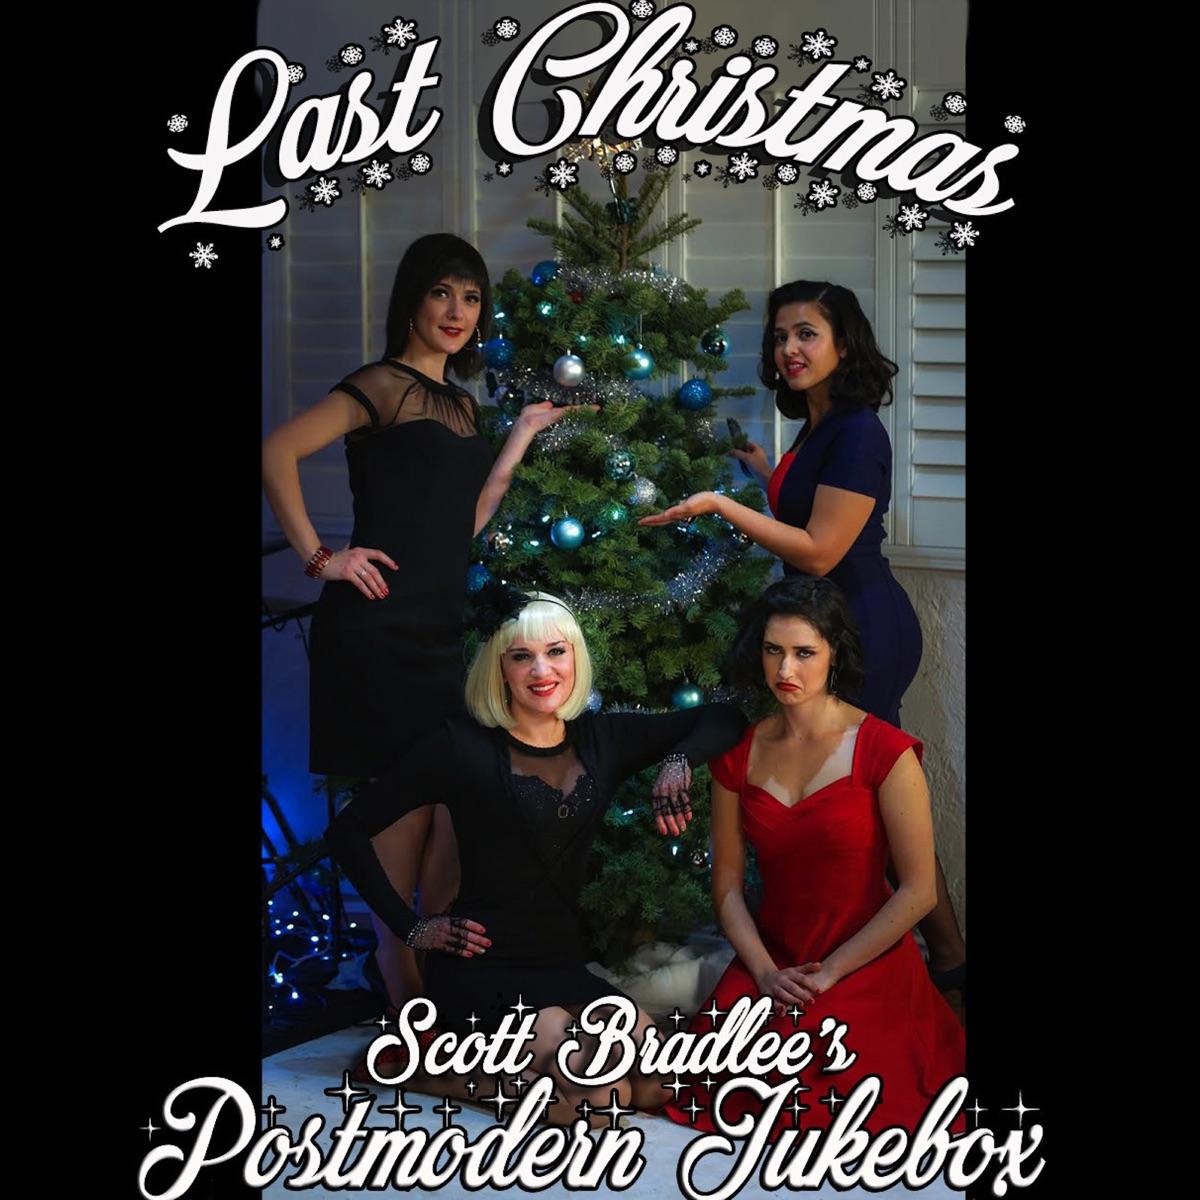 Last Christmas Album Cover.Last Christmas Single Album Cover By Scott Bradlee S